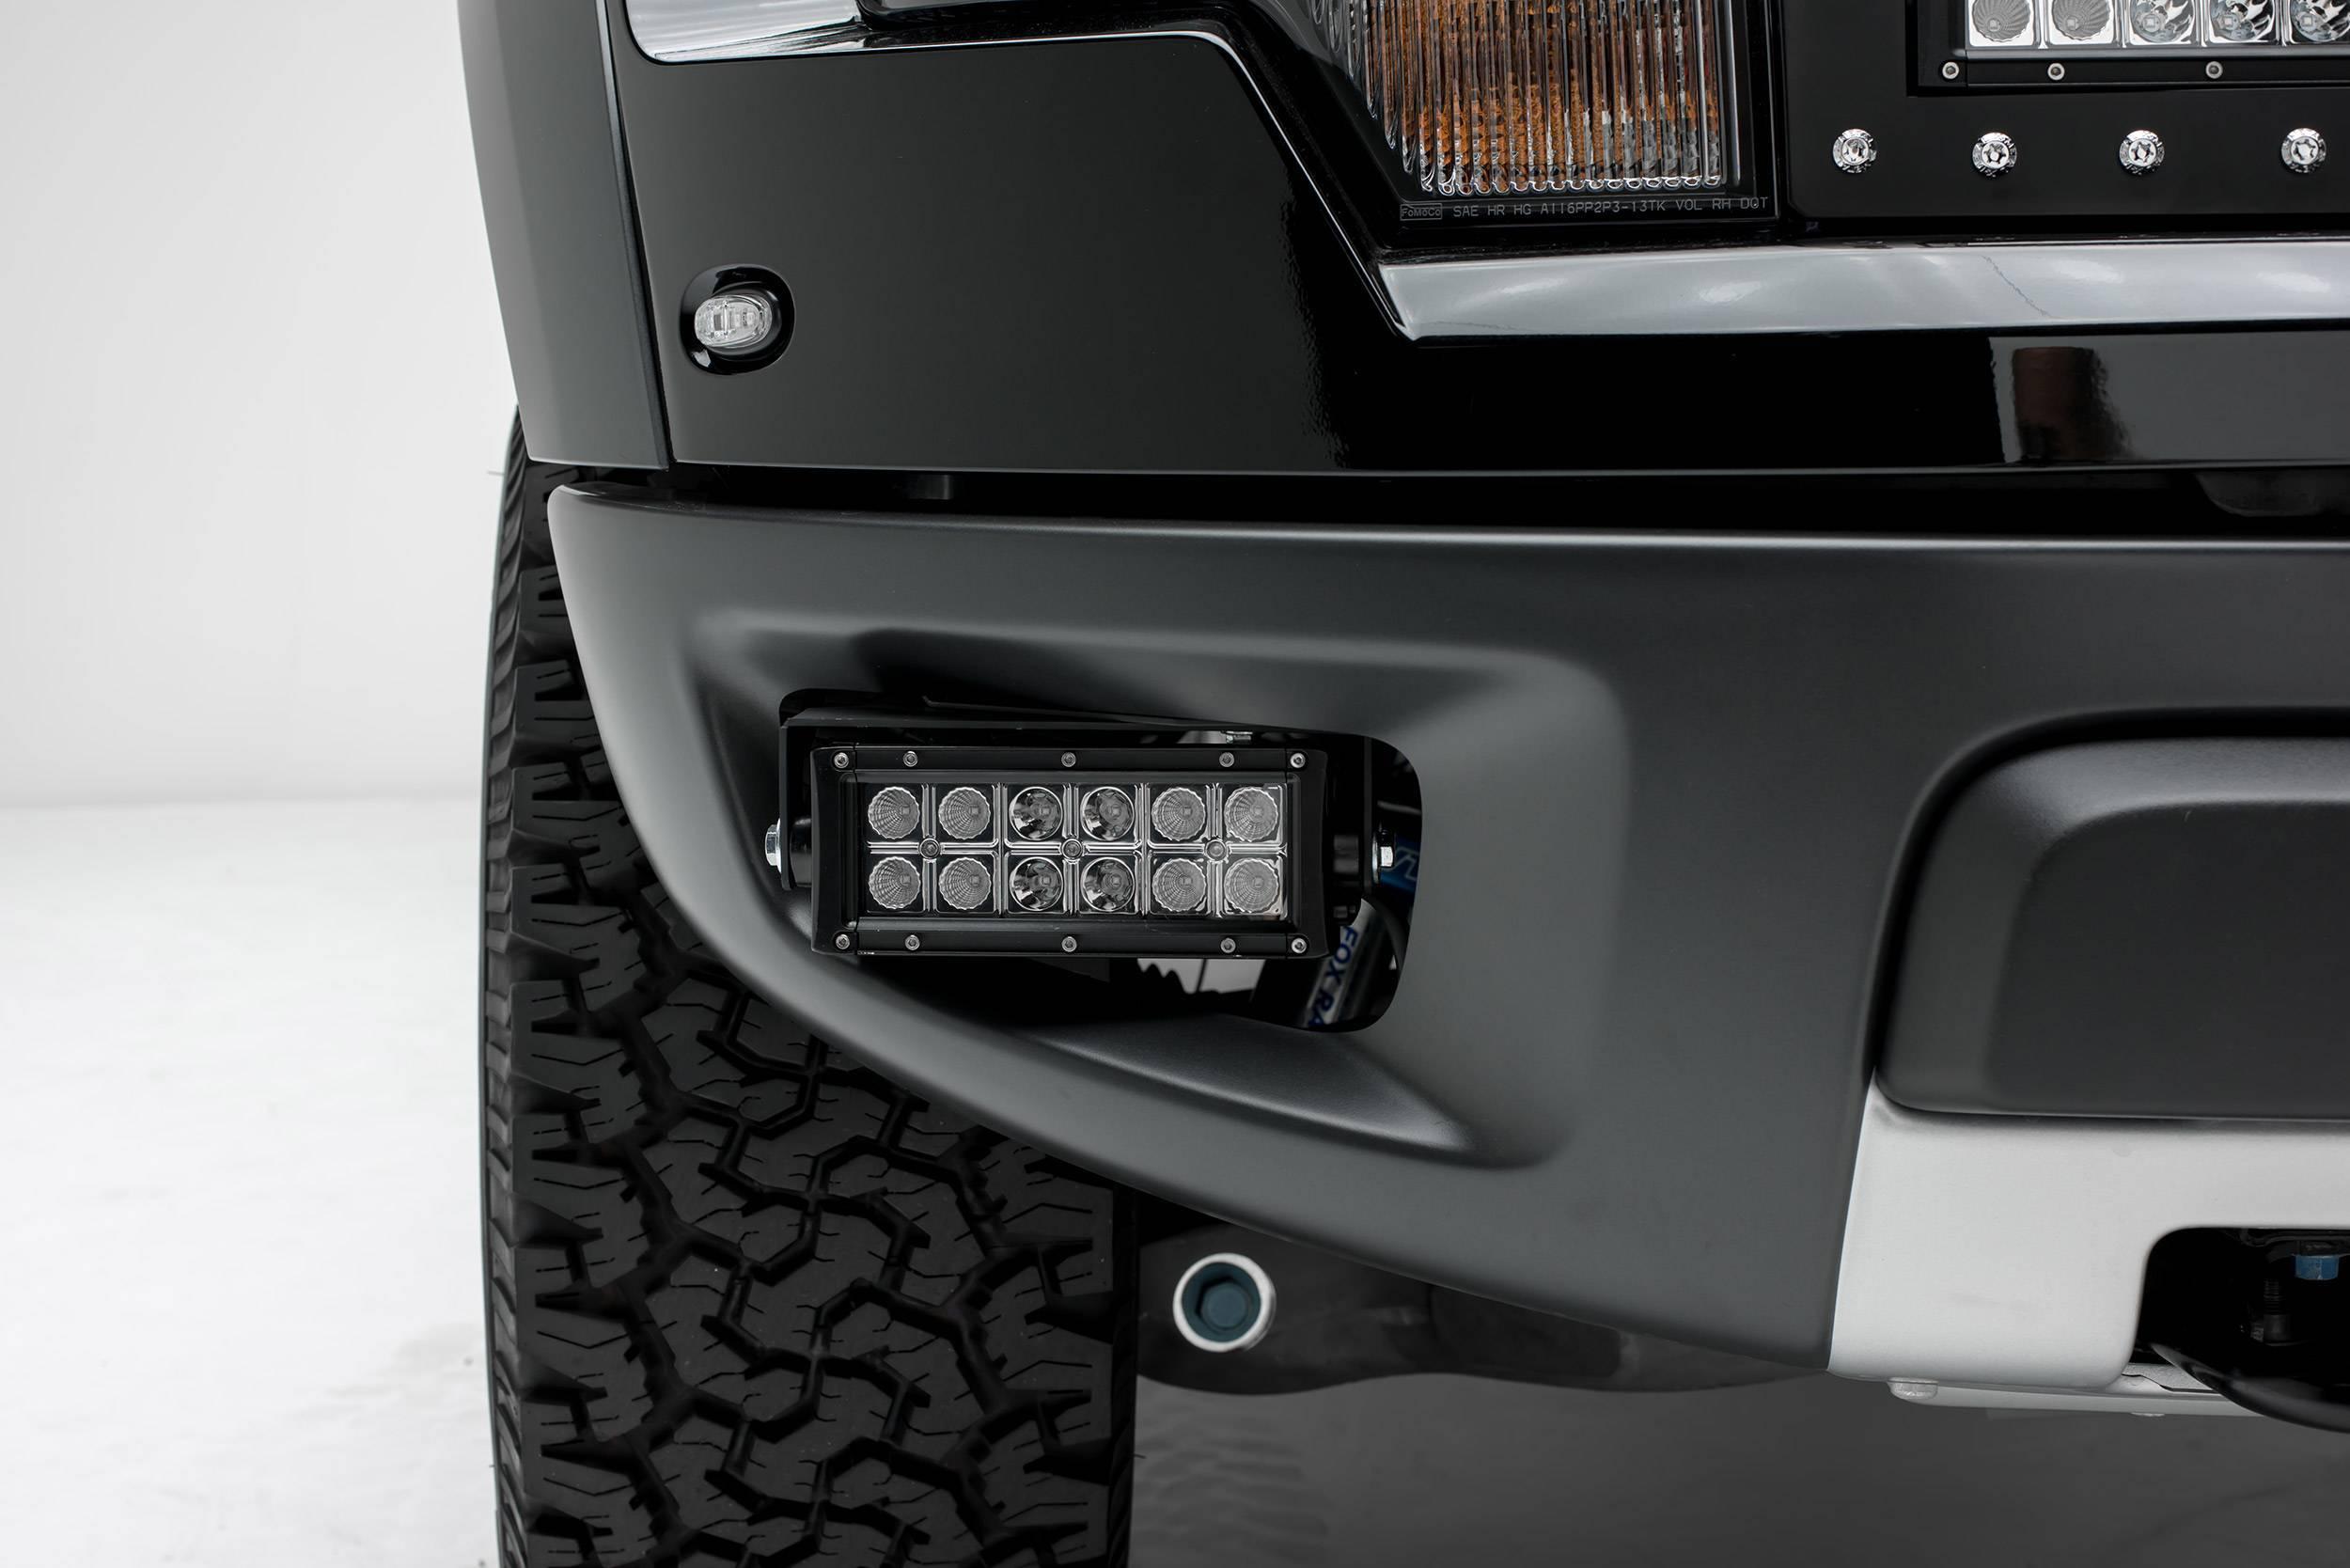 ZROADZ - 2010-2014 Ford F-150 Raptor Front Bumper OEM Fog LED Kit with (2) 6 Inch LED Straight Double Row Light Bars - PN #Z325651-KIT